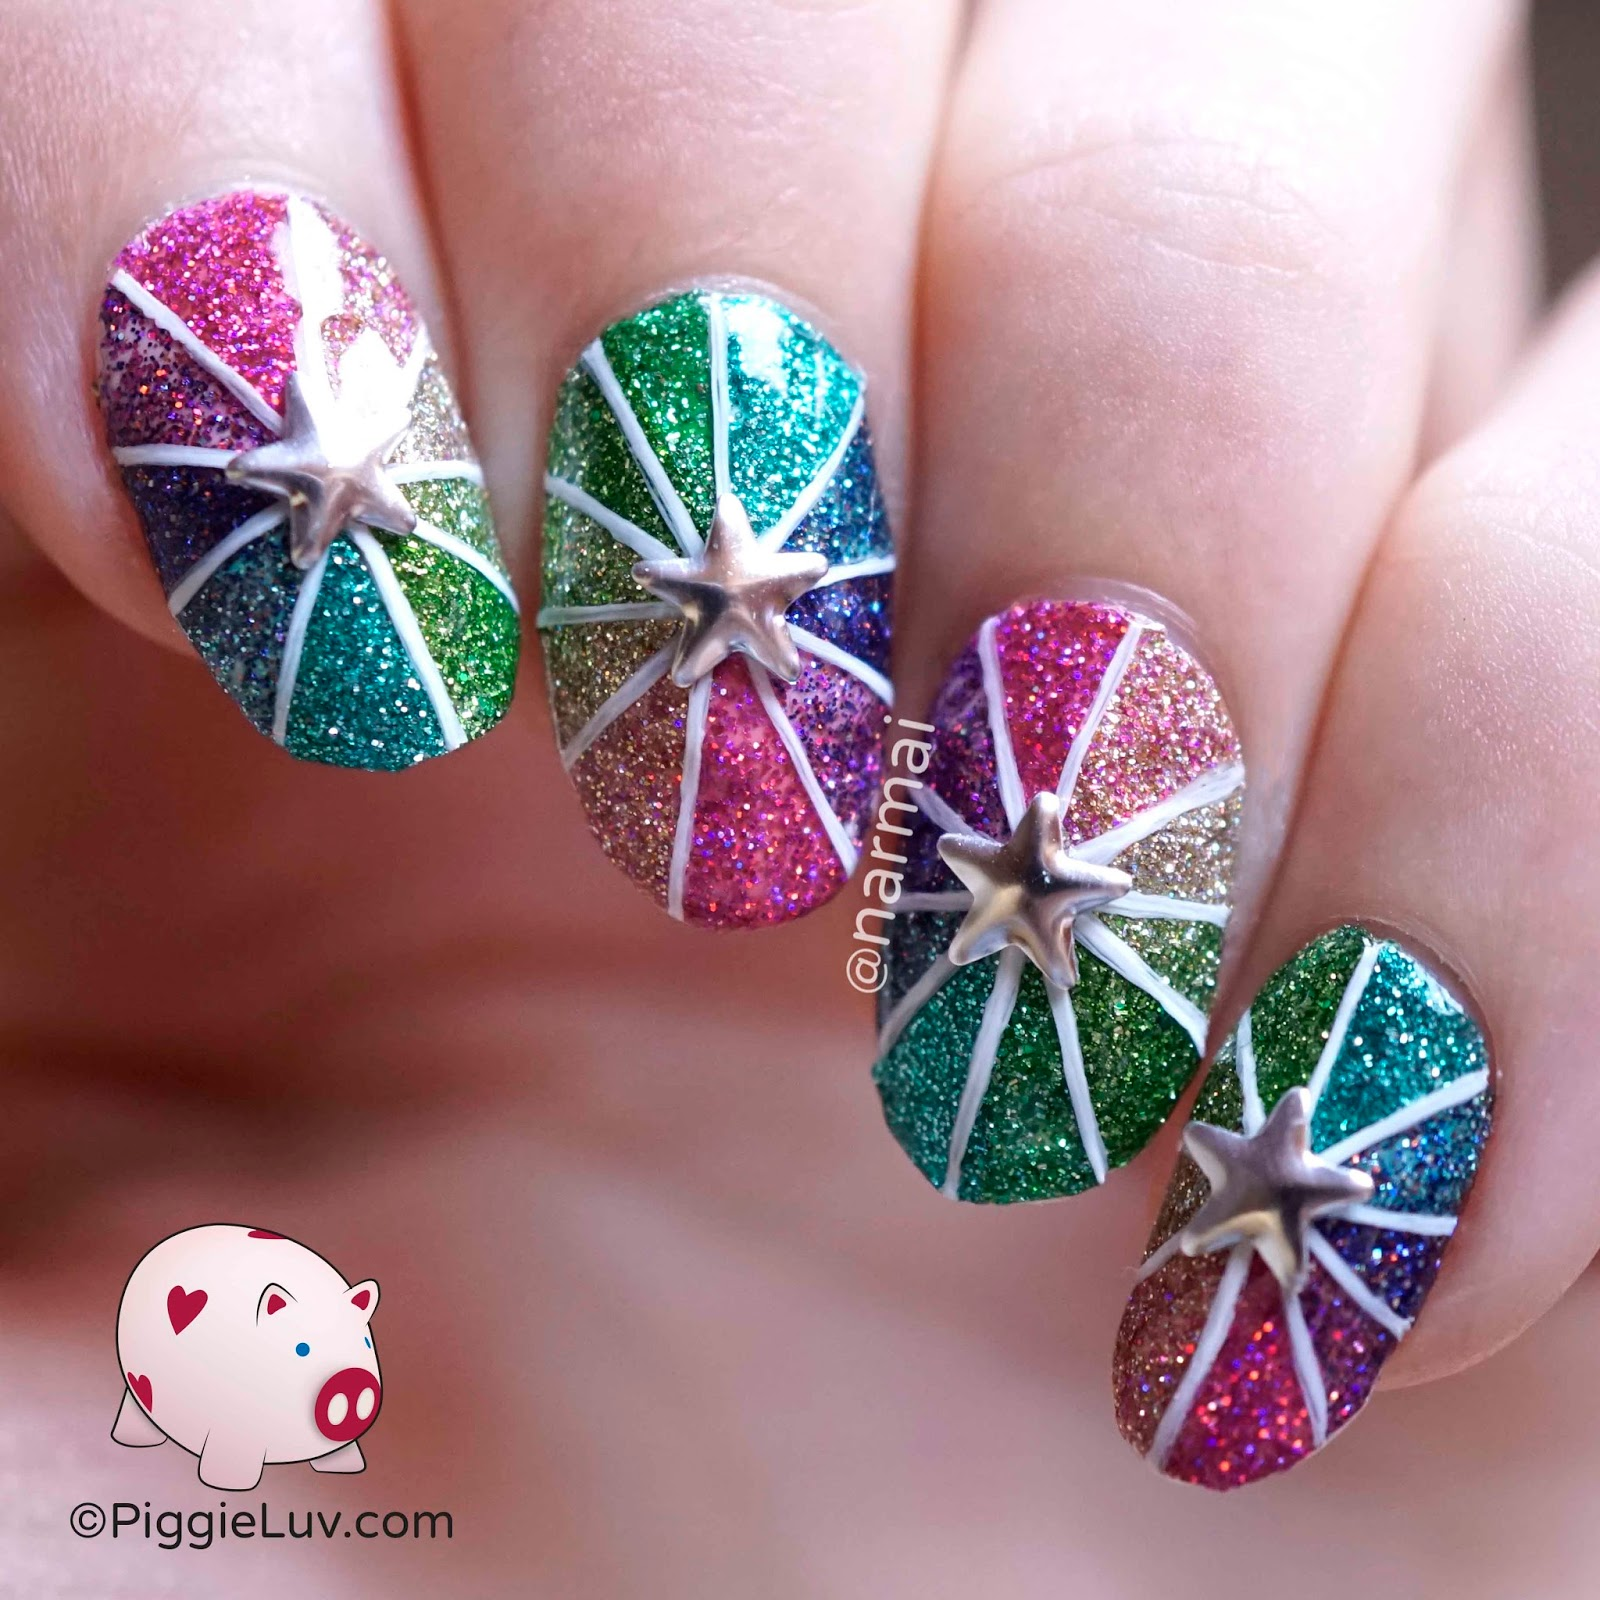 PiggieLuv: Glitter pinwheel nail art